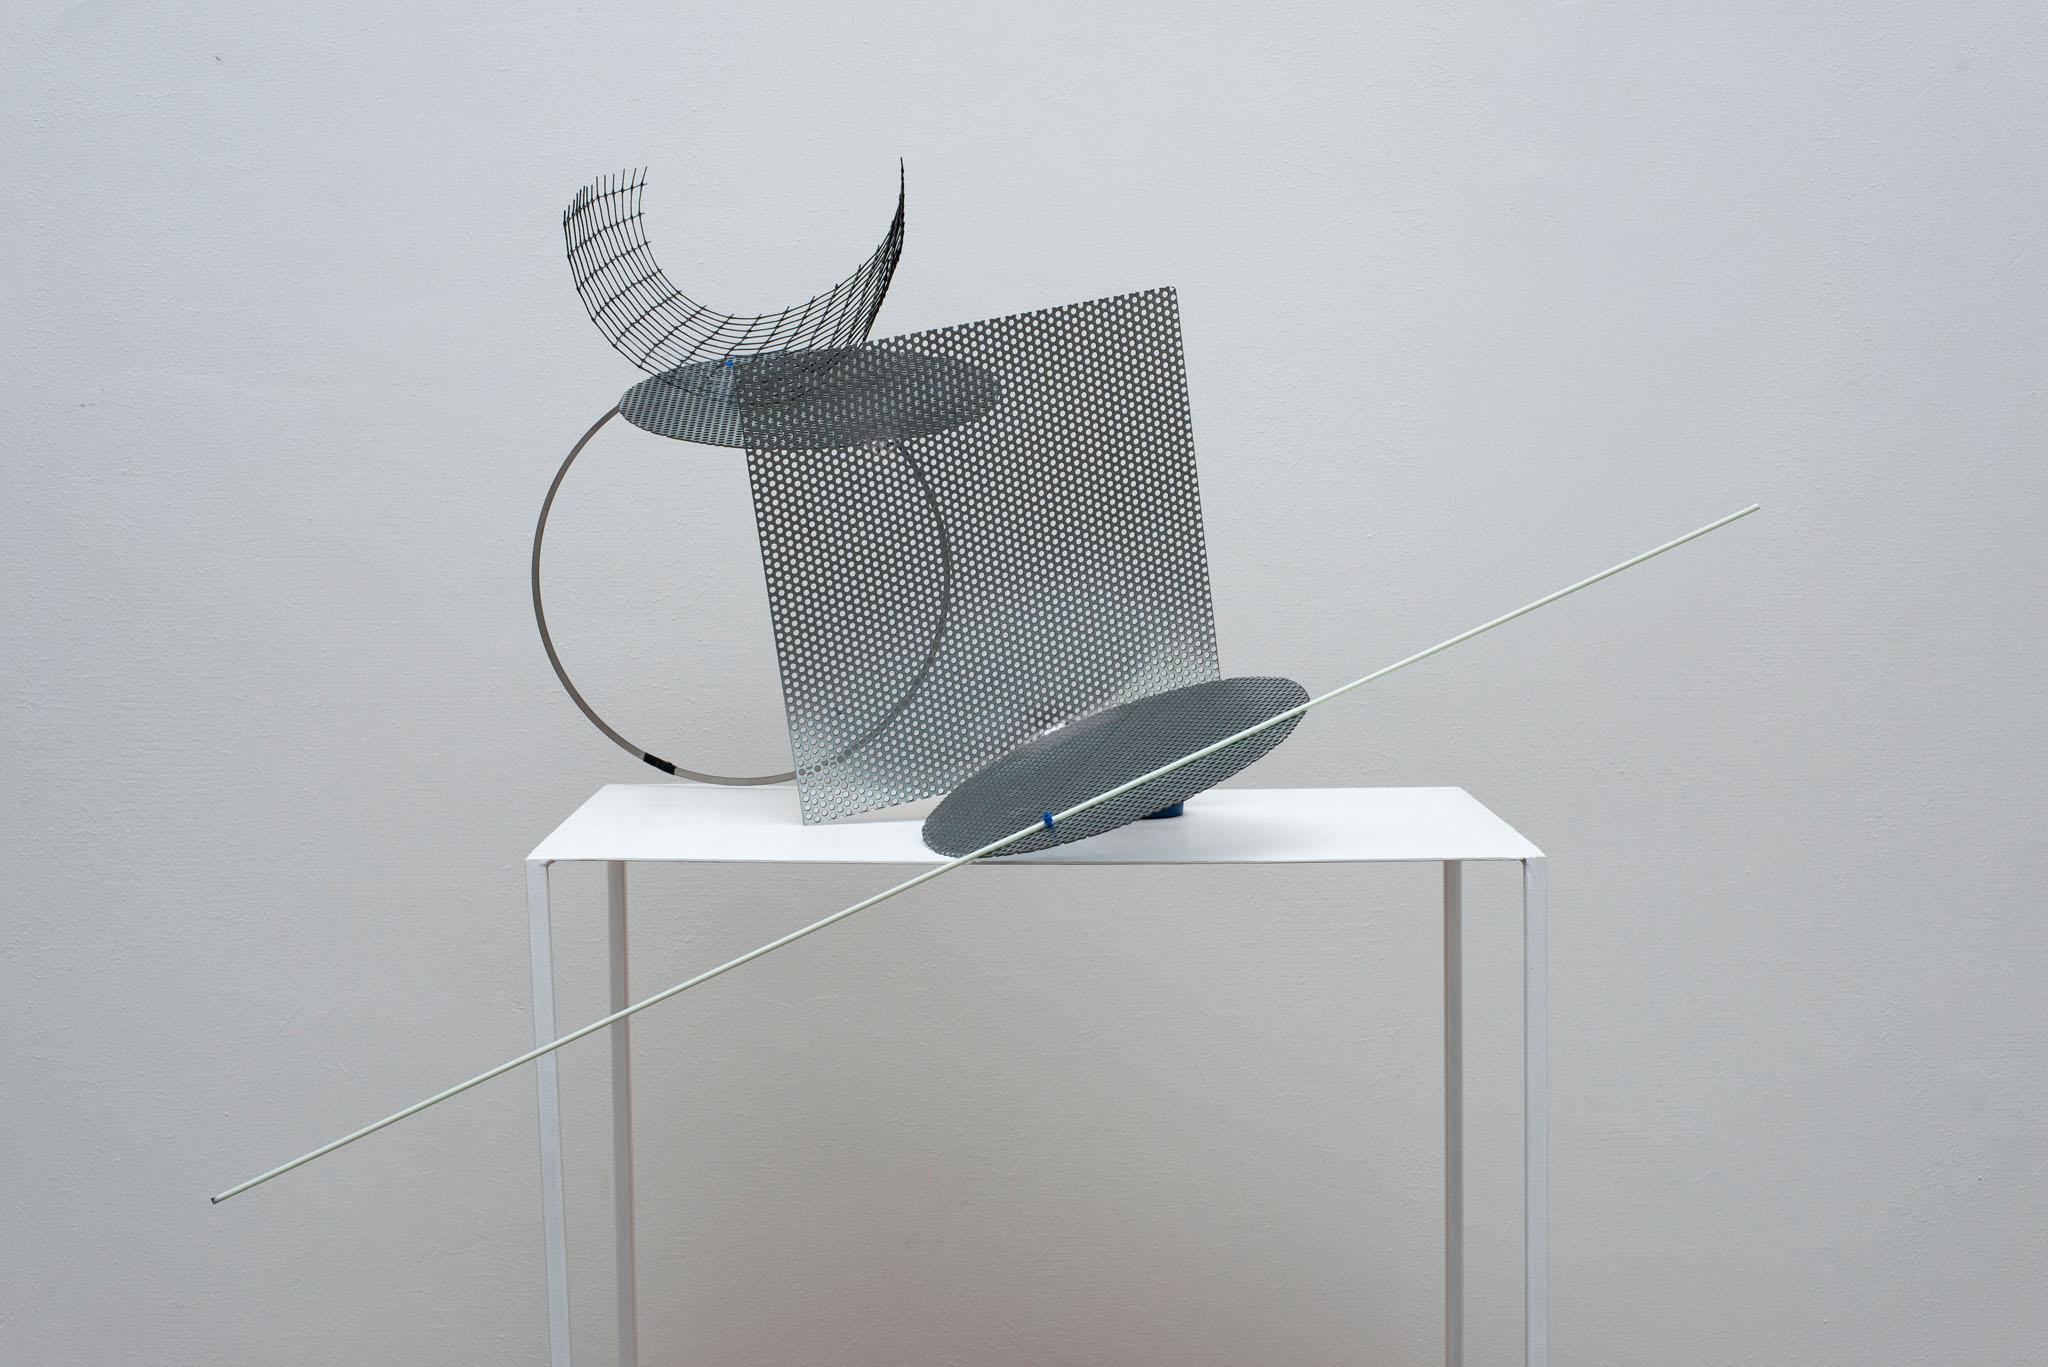 Alice Cattaneo, 'Untitled', 2015, Iron, paint, cable ties, plastic mesh, fiberglass rod, scotch 180 x 80 x 50 cm ca. Courtesy Galleria Marie-Laure Fleisch and the artist. Photo: Giorgio Benni.